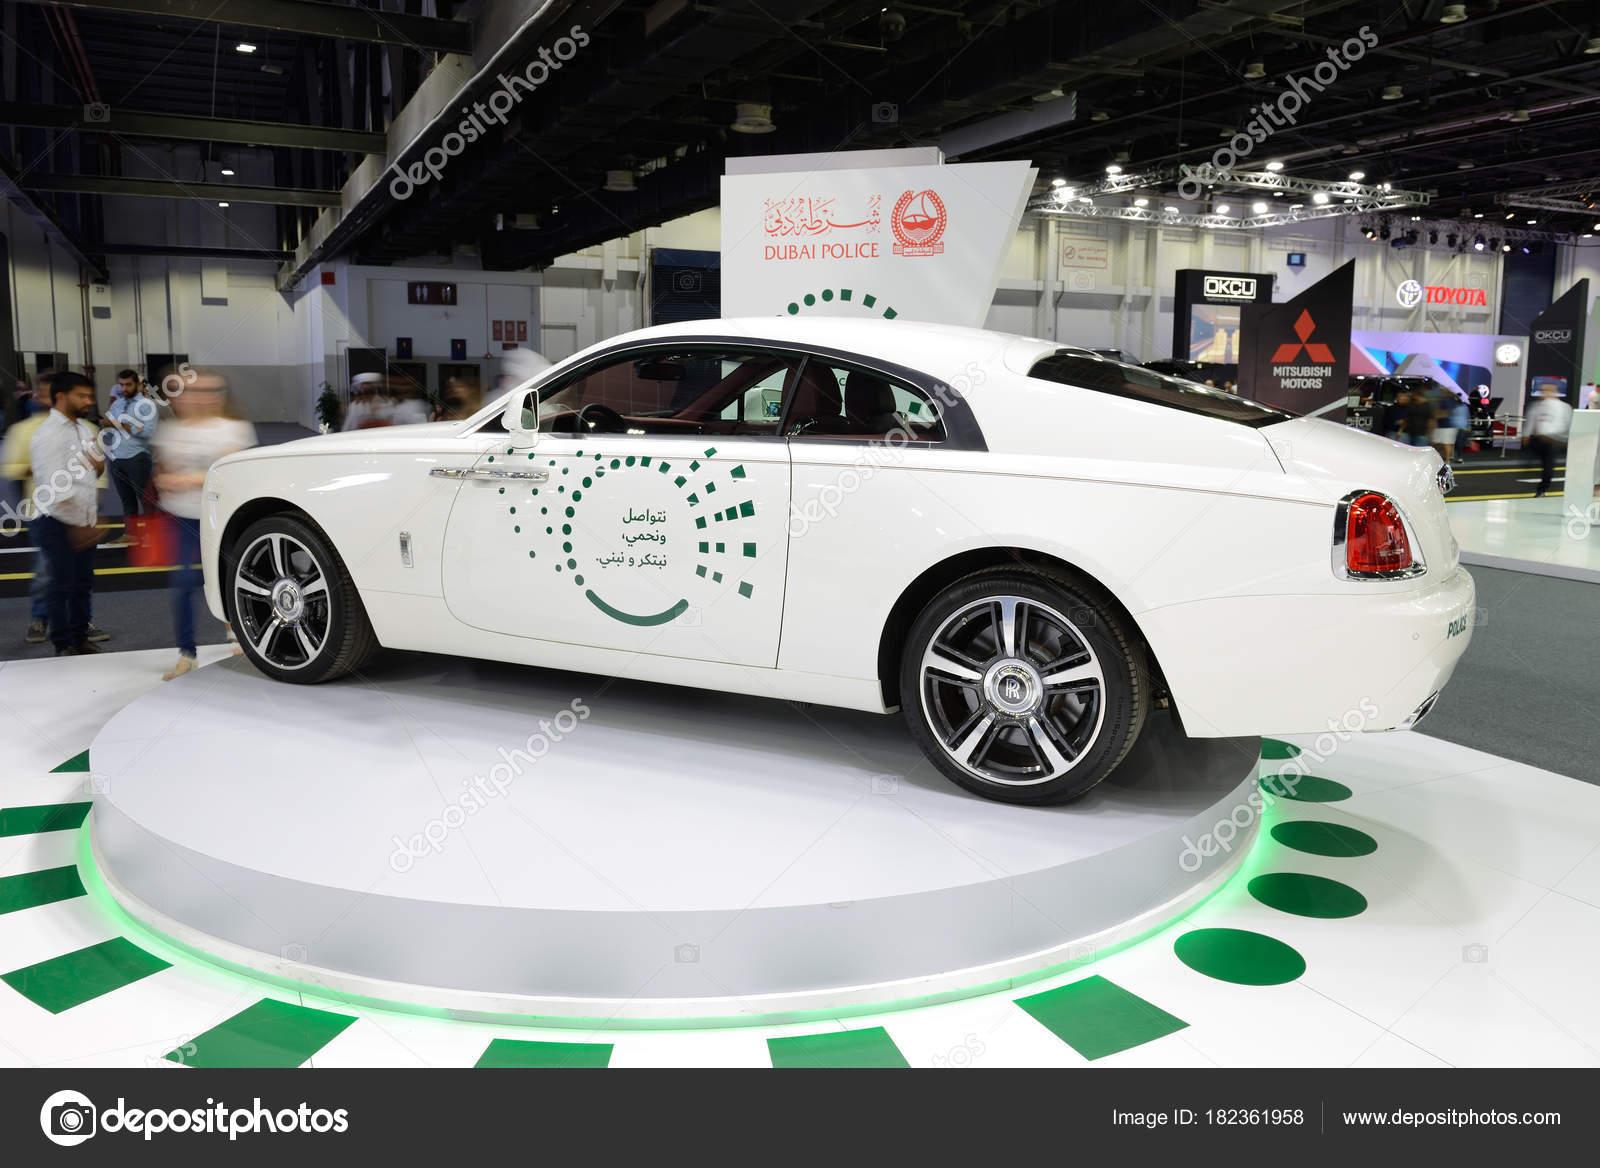 Pictures : police cars in dubai | DUBAI, UAE - NOVEMBER 18